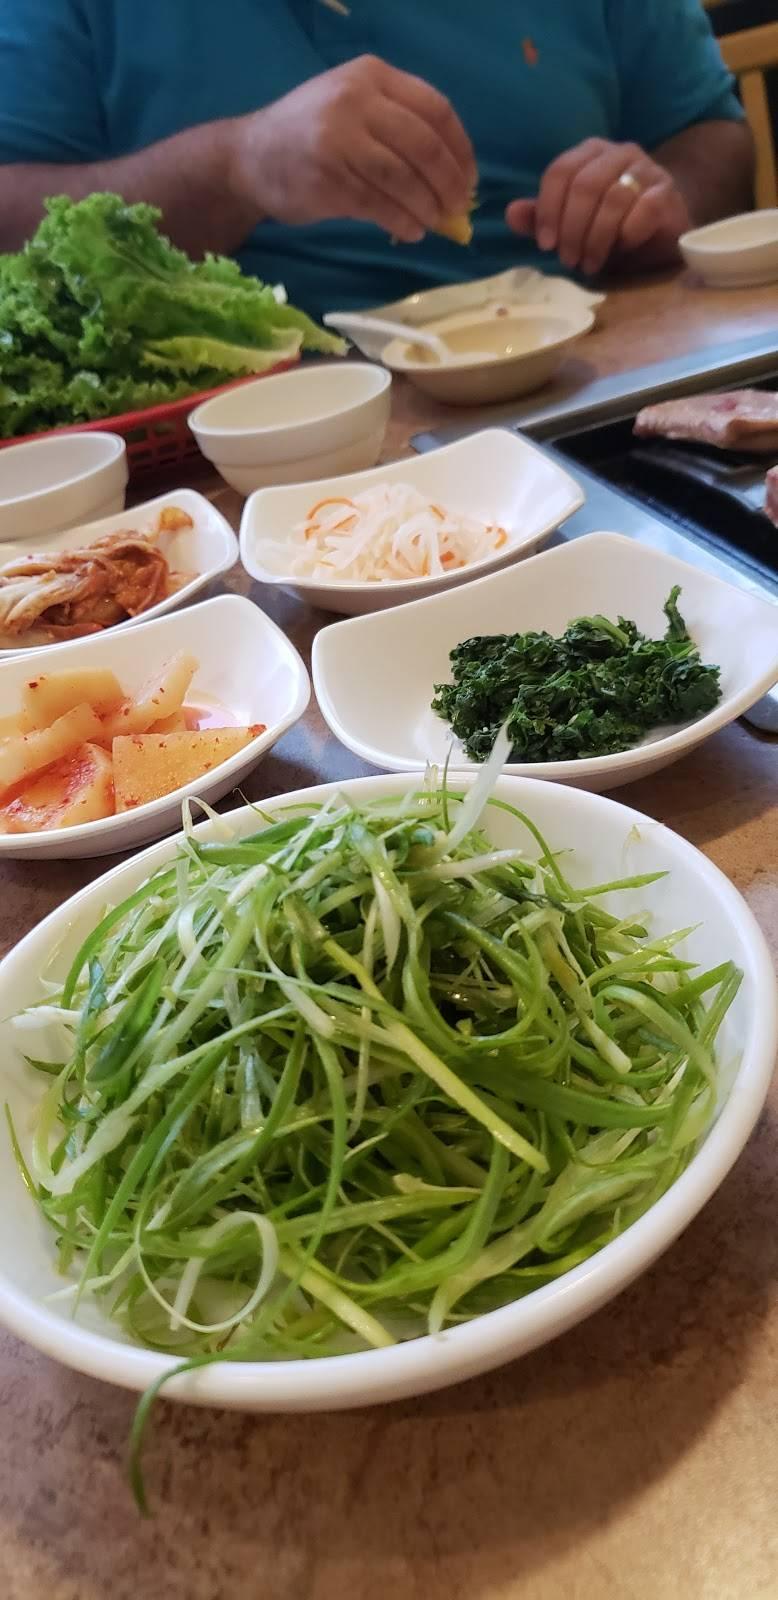 Kum Kang San Restaurant | restaurant | 1333 W Dundee Rd, Buffalo Grove, IL 60089, USA | 8474839000 OR +1 847-483-9000